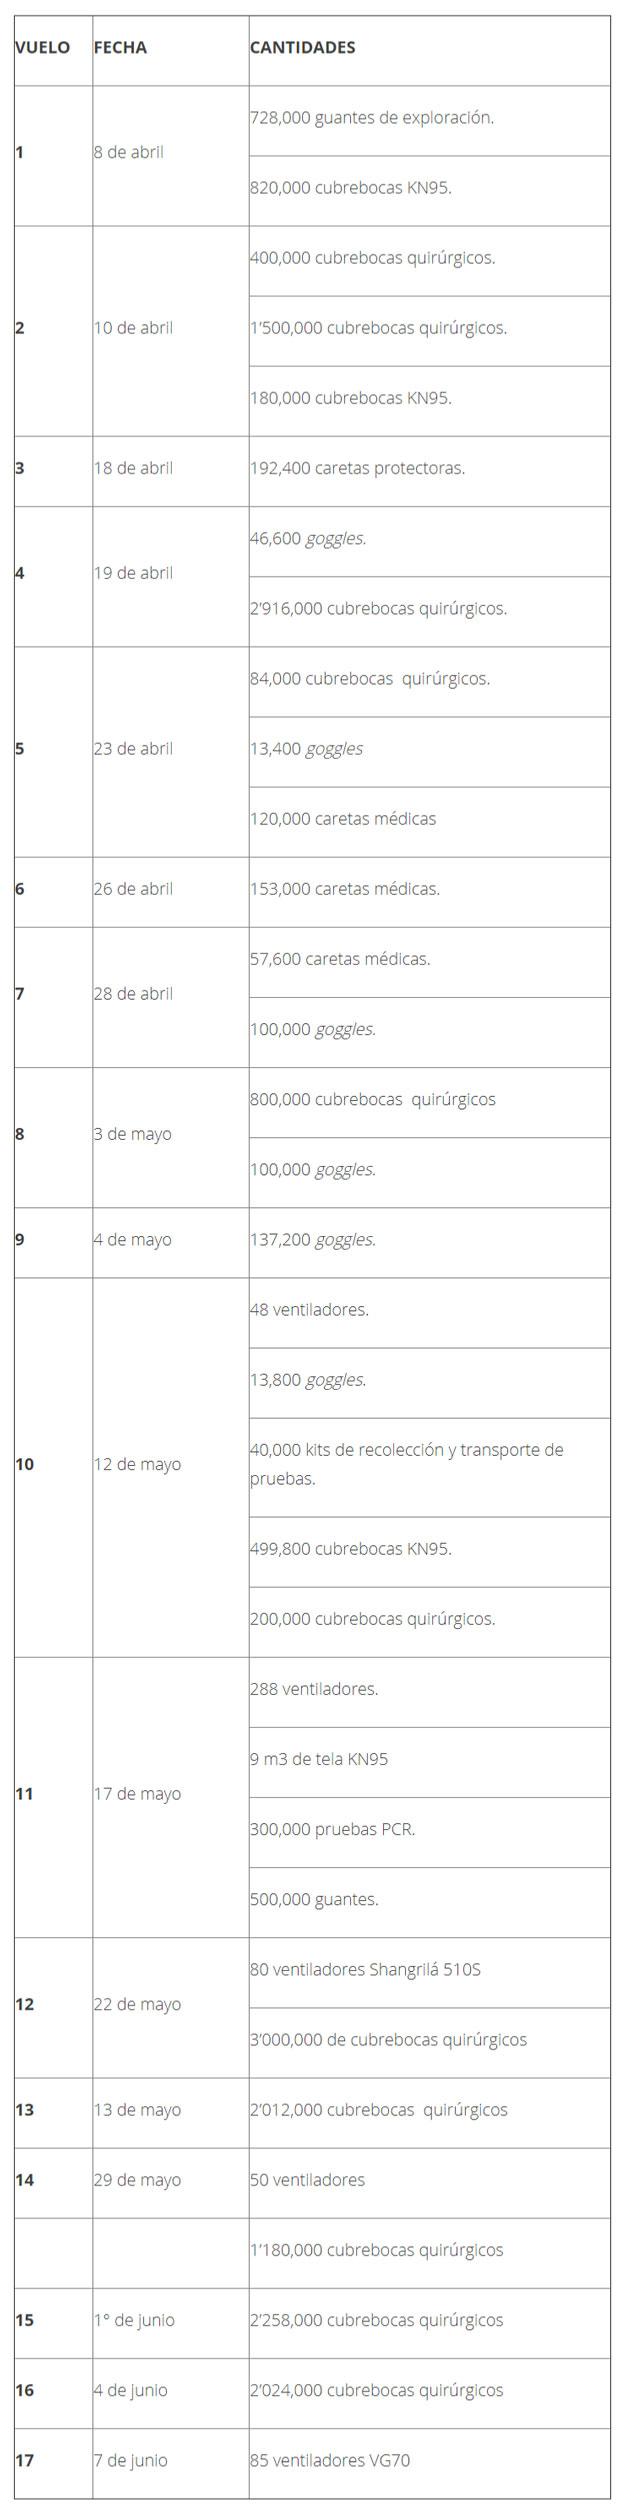 Llegan a México 85 ventiladores para pacientes graves por Covid-19